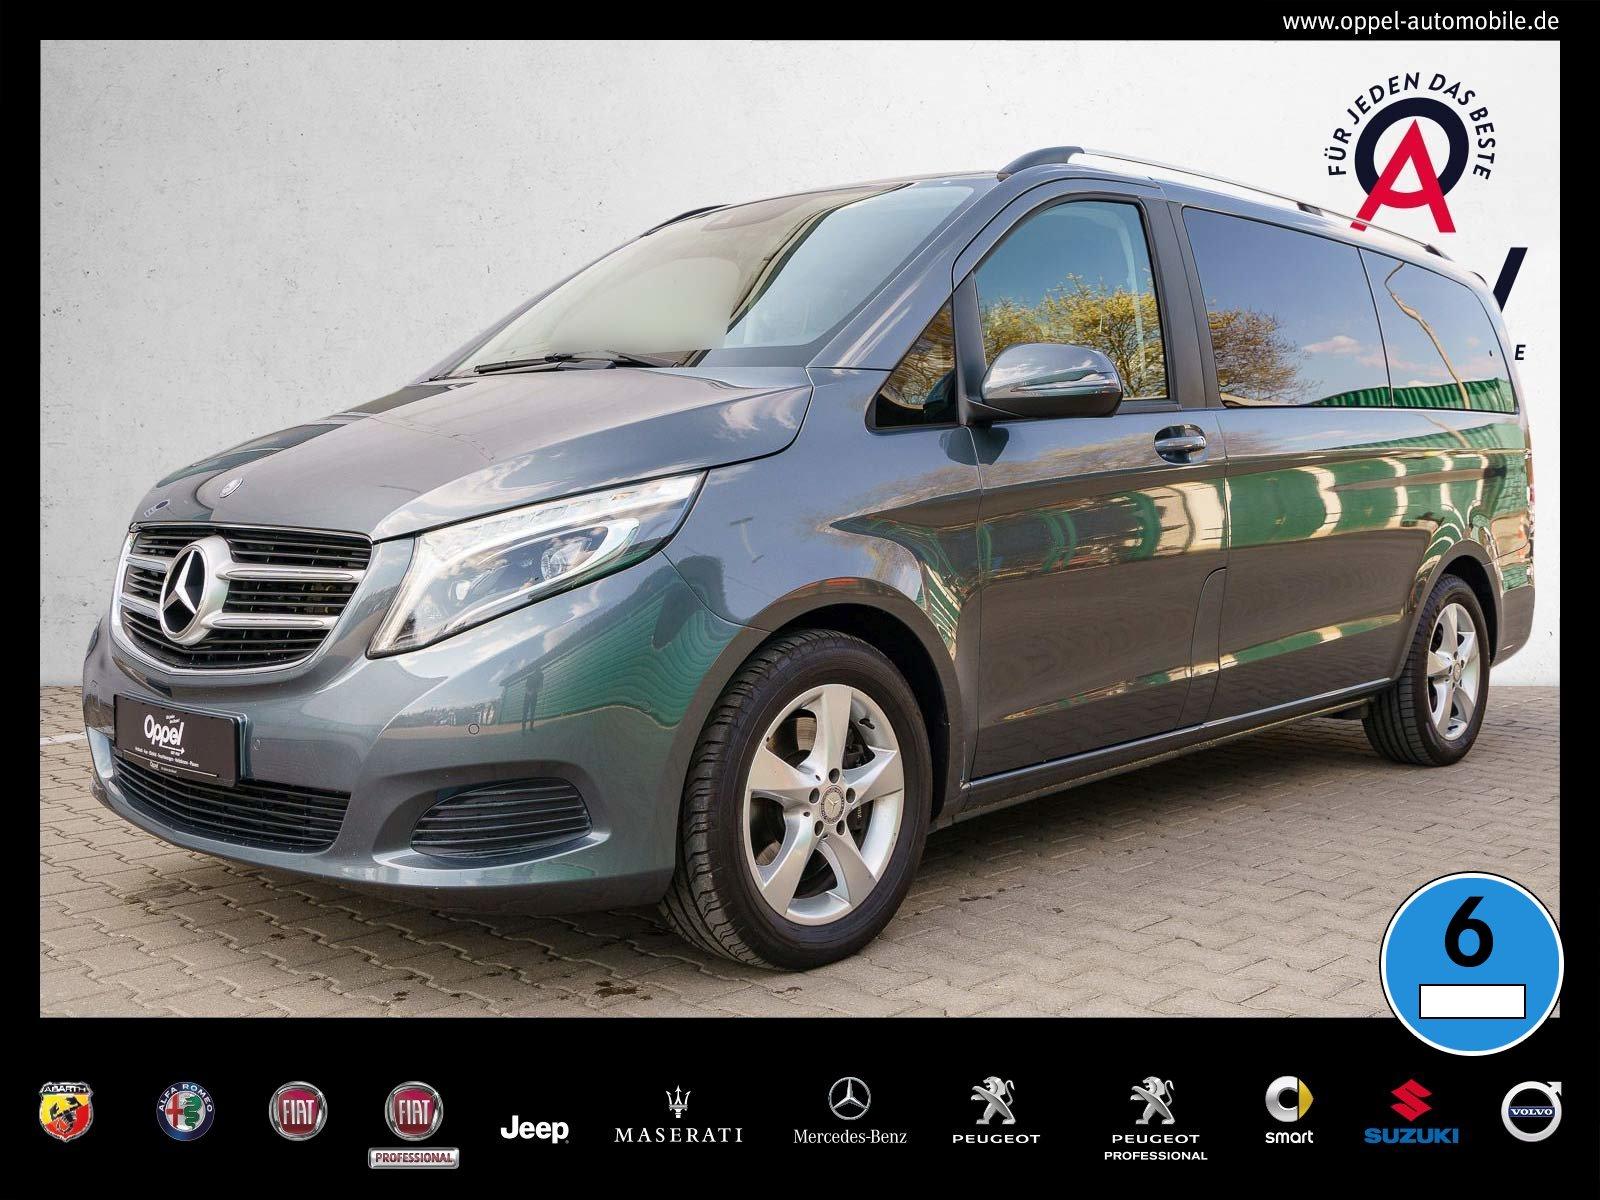 Mercedes-Benz V 220 d +AHK+KLIMA+NAVI+PARKTR.+KAMERA+TEMPOMAT+, Jahr 2017, Diesel